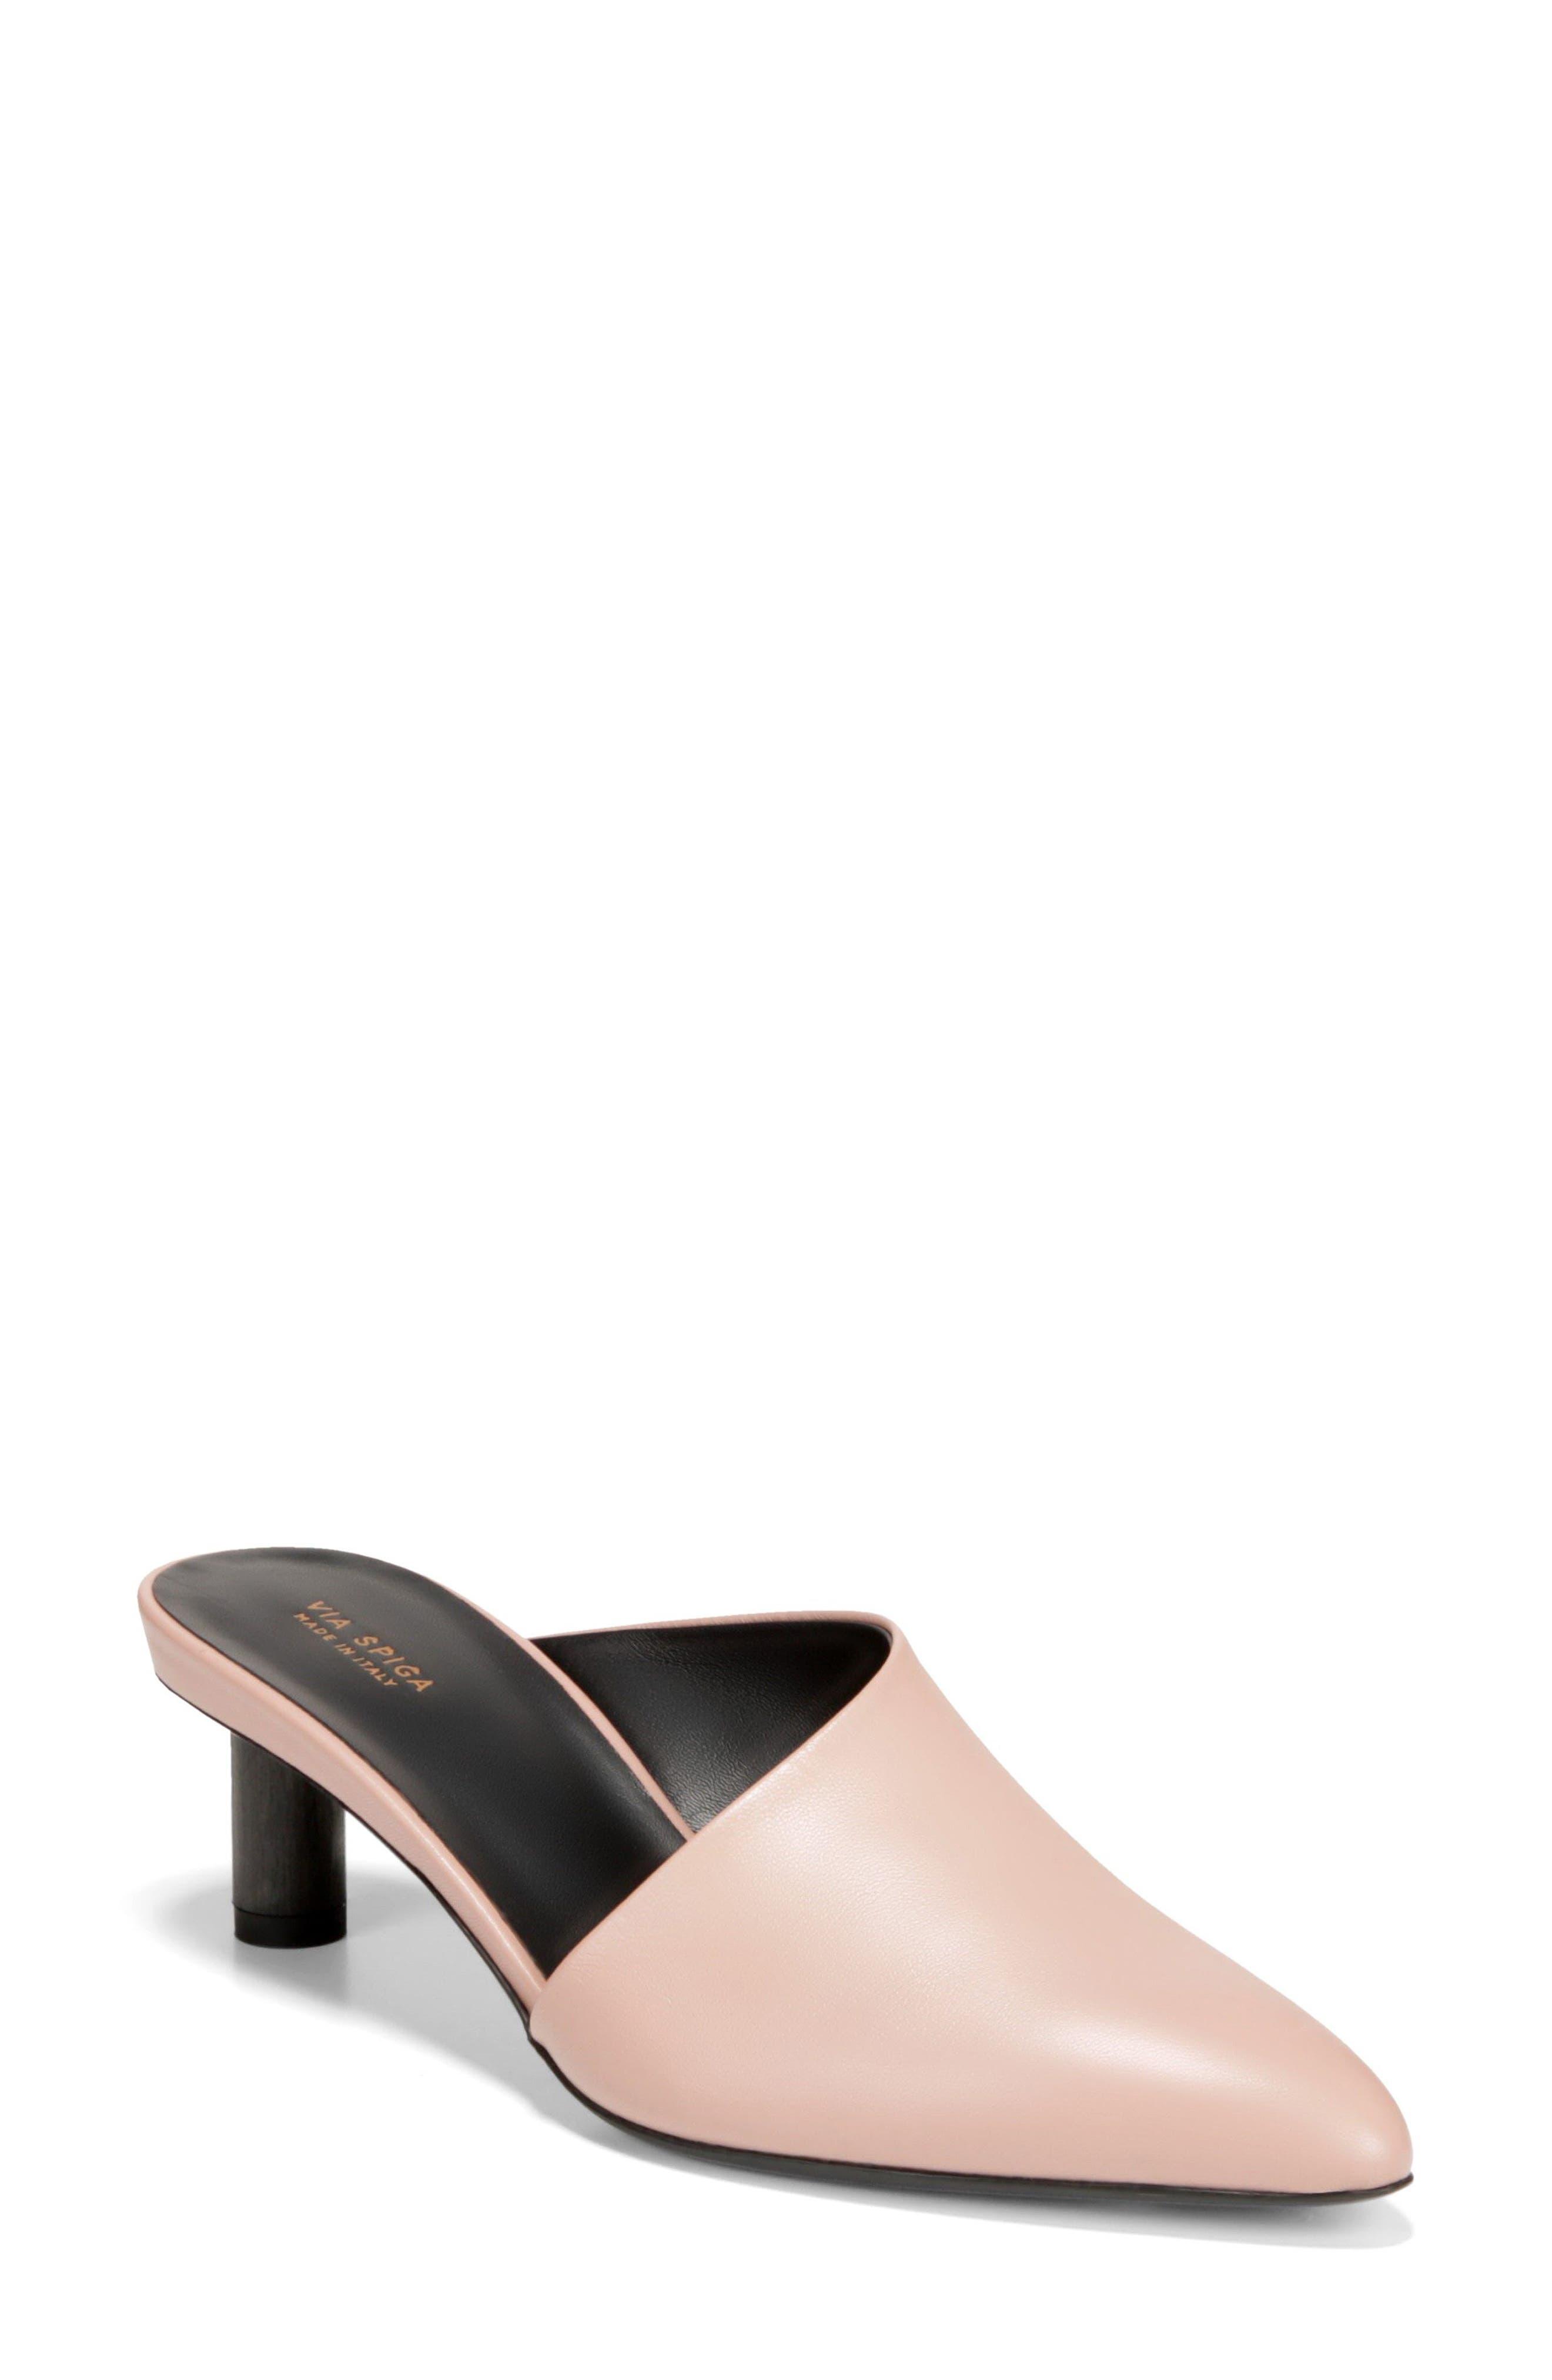 Freya Asymmetrical Mule,                             Main thumbnail 1, color,                             Sand Leather